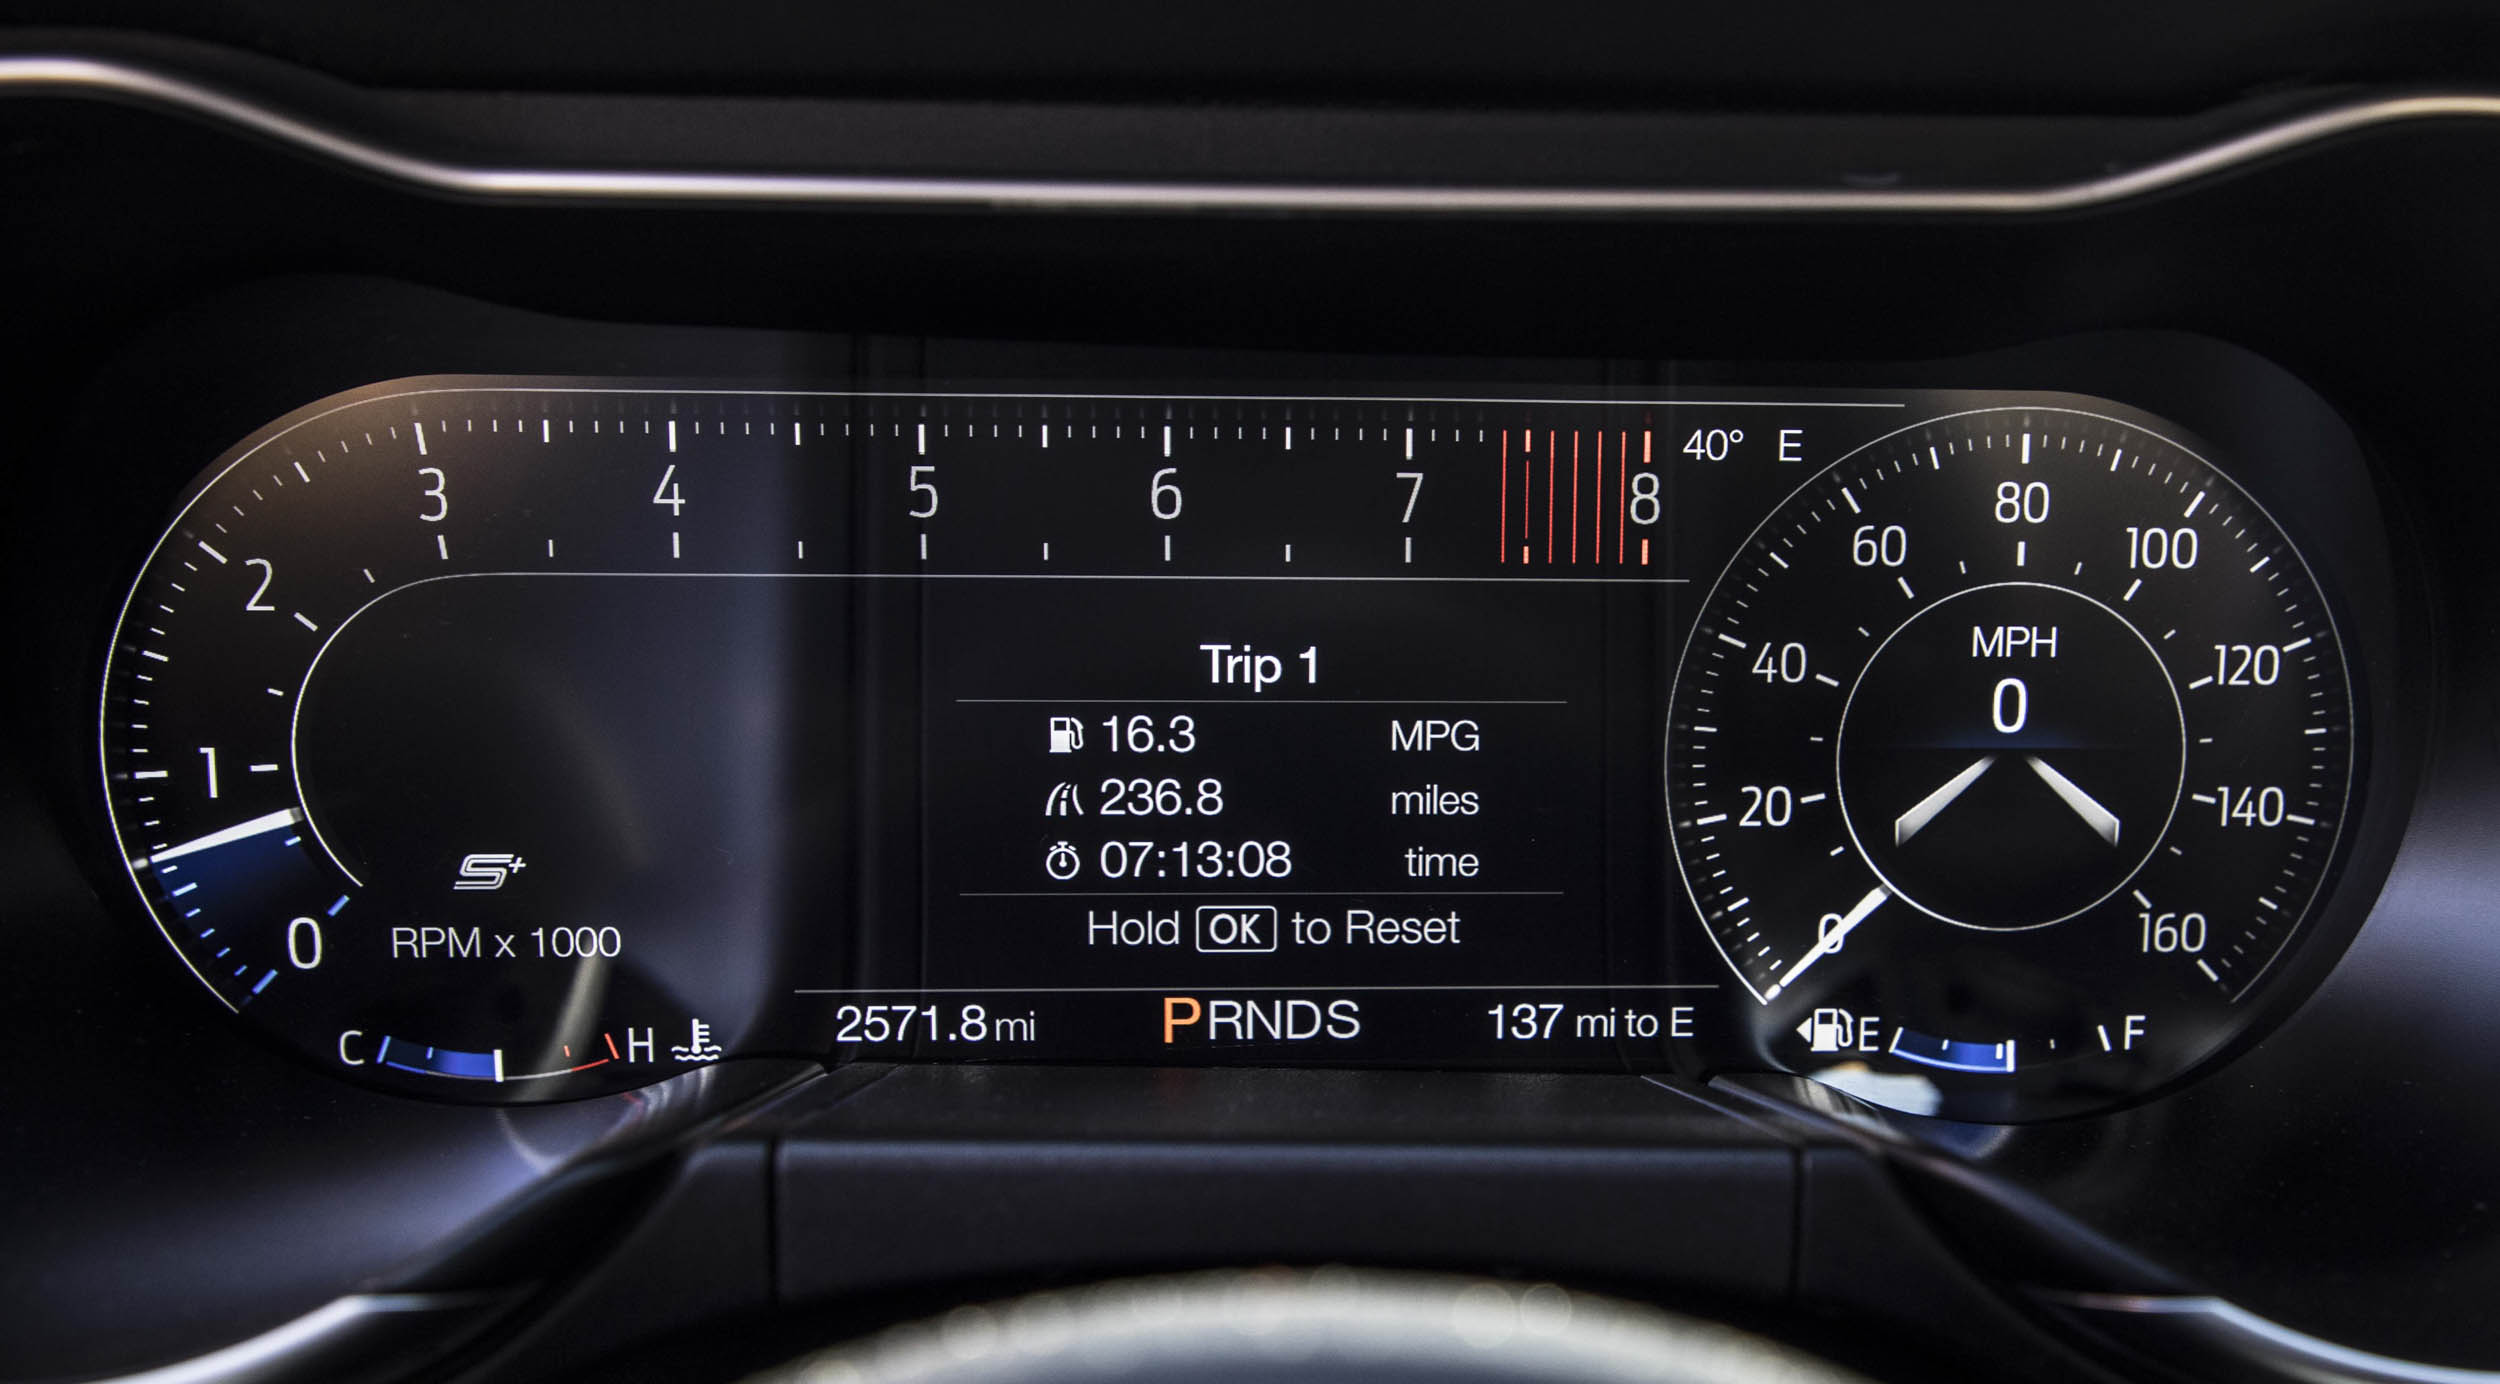 2018 Ford Mustang GT gauge cluster